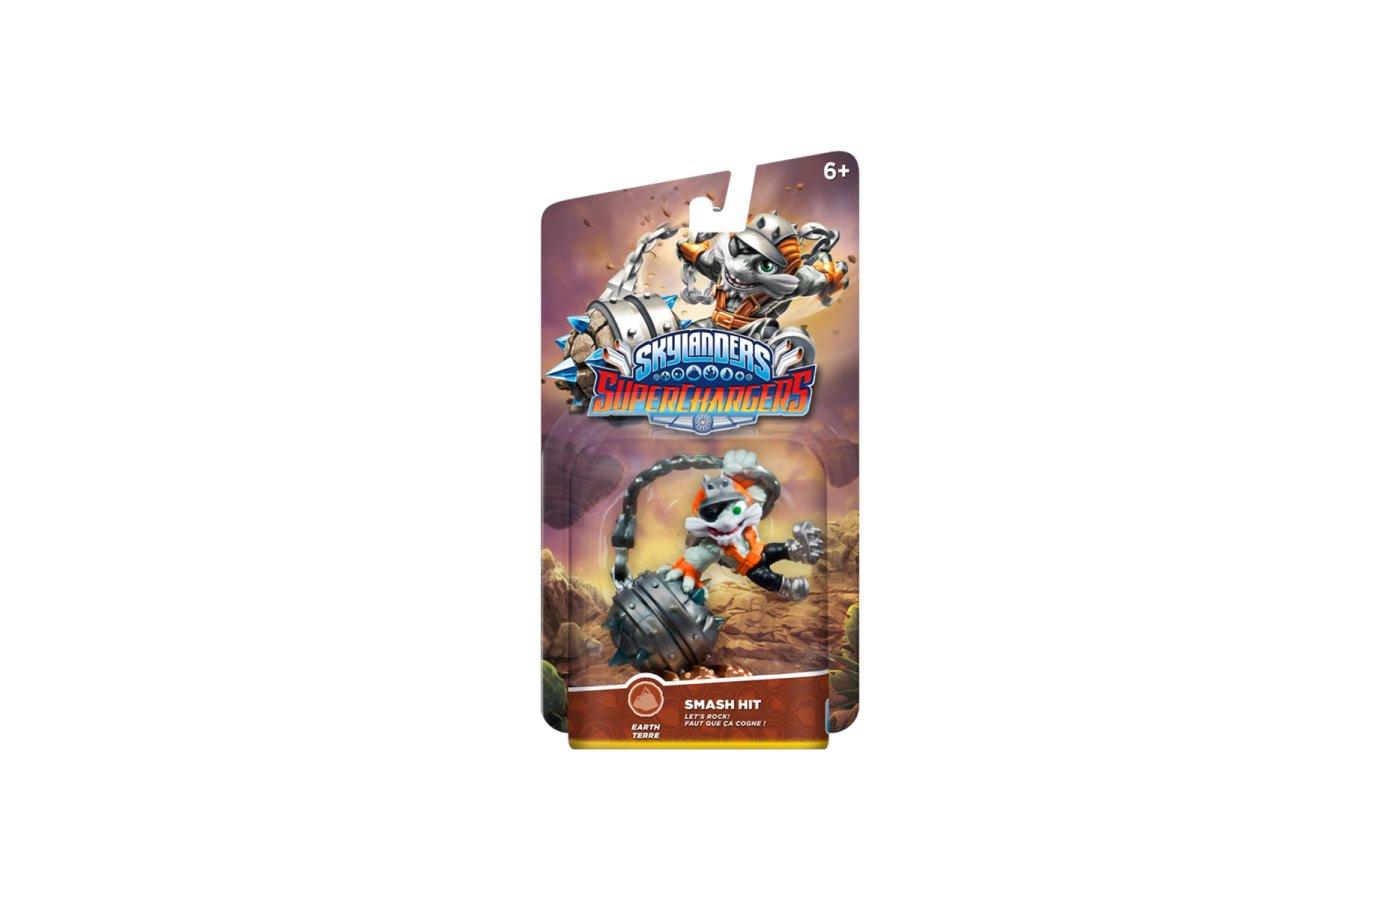 Аксессуар. Фигурка Skylanders SuperChargers суперзаряд - SMASH HIT (стихия Earth).